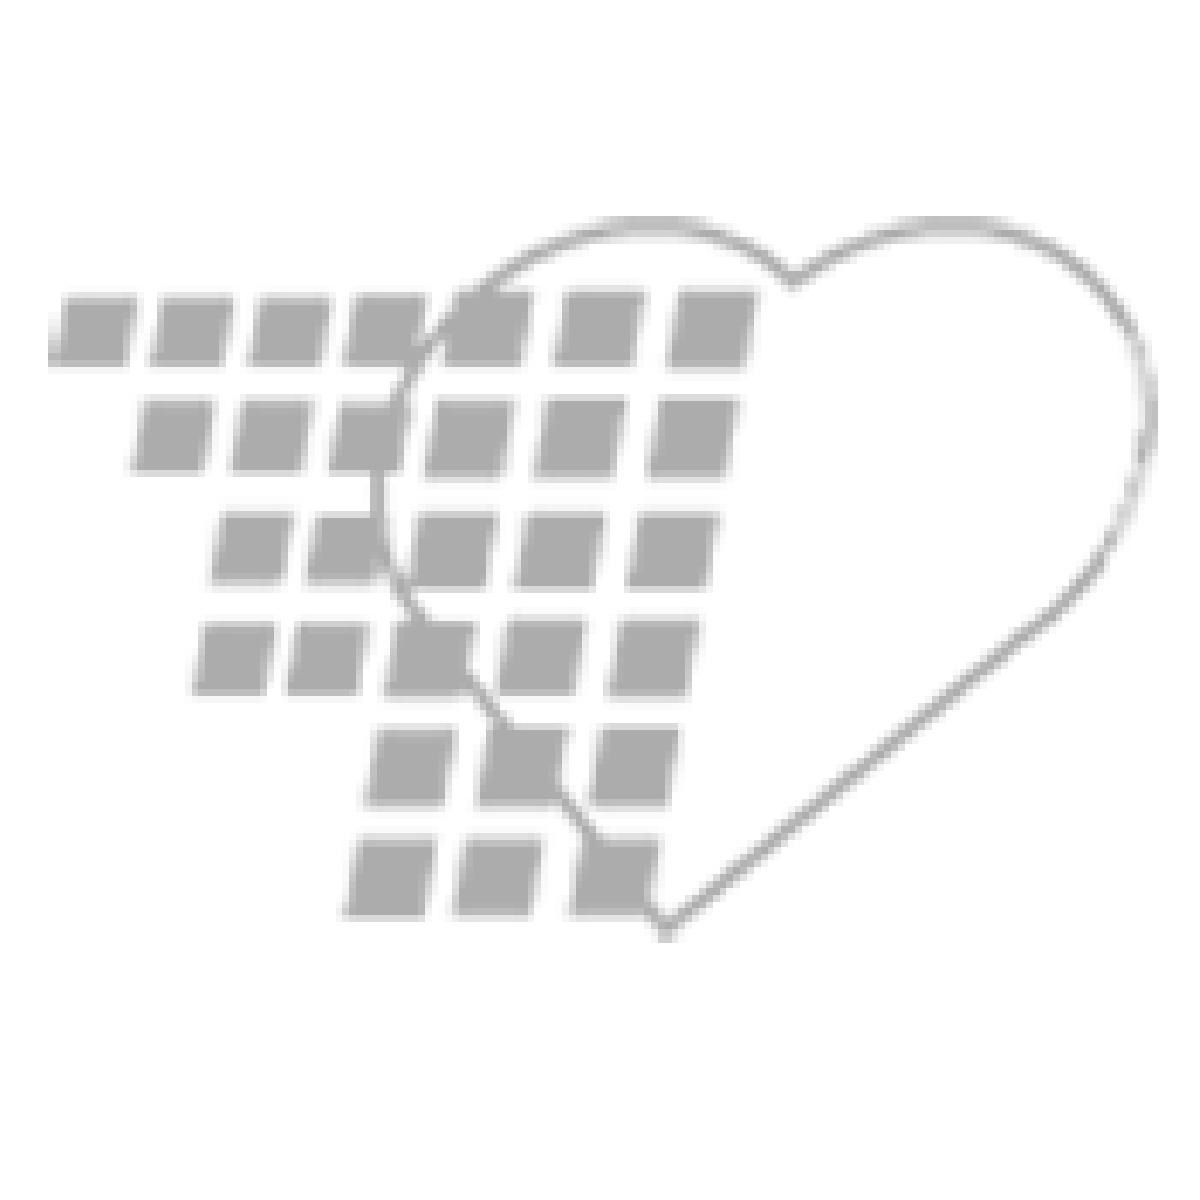 12-81-1167 Nasco Life/form® Infant Patient Education Tracheostomy Care Manikin